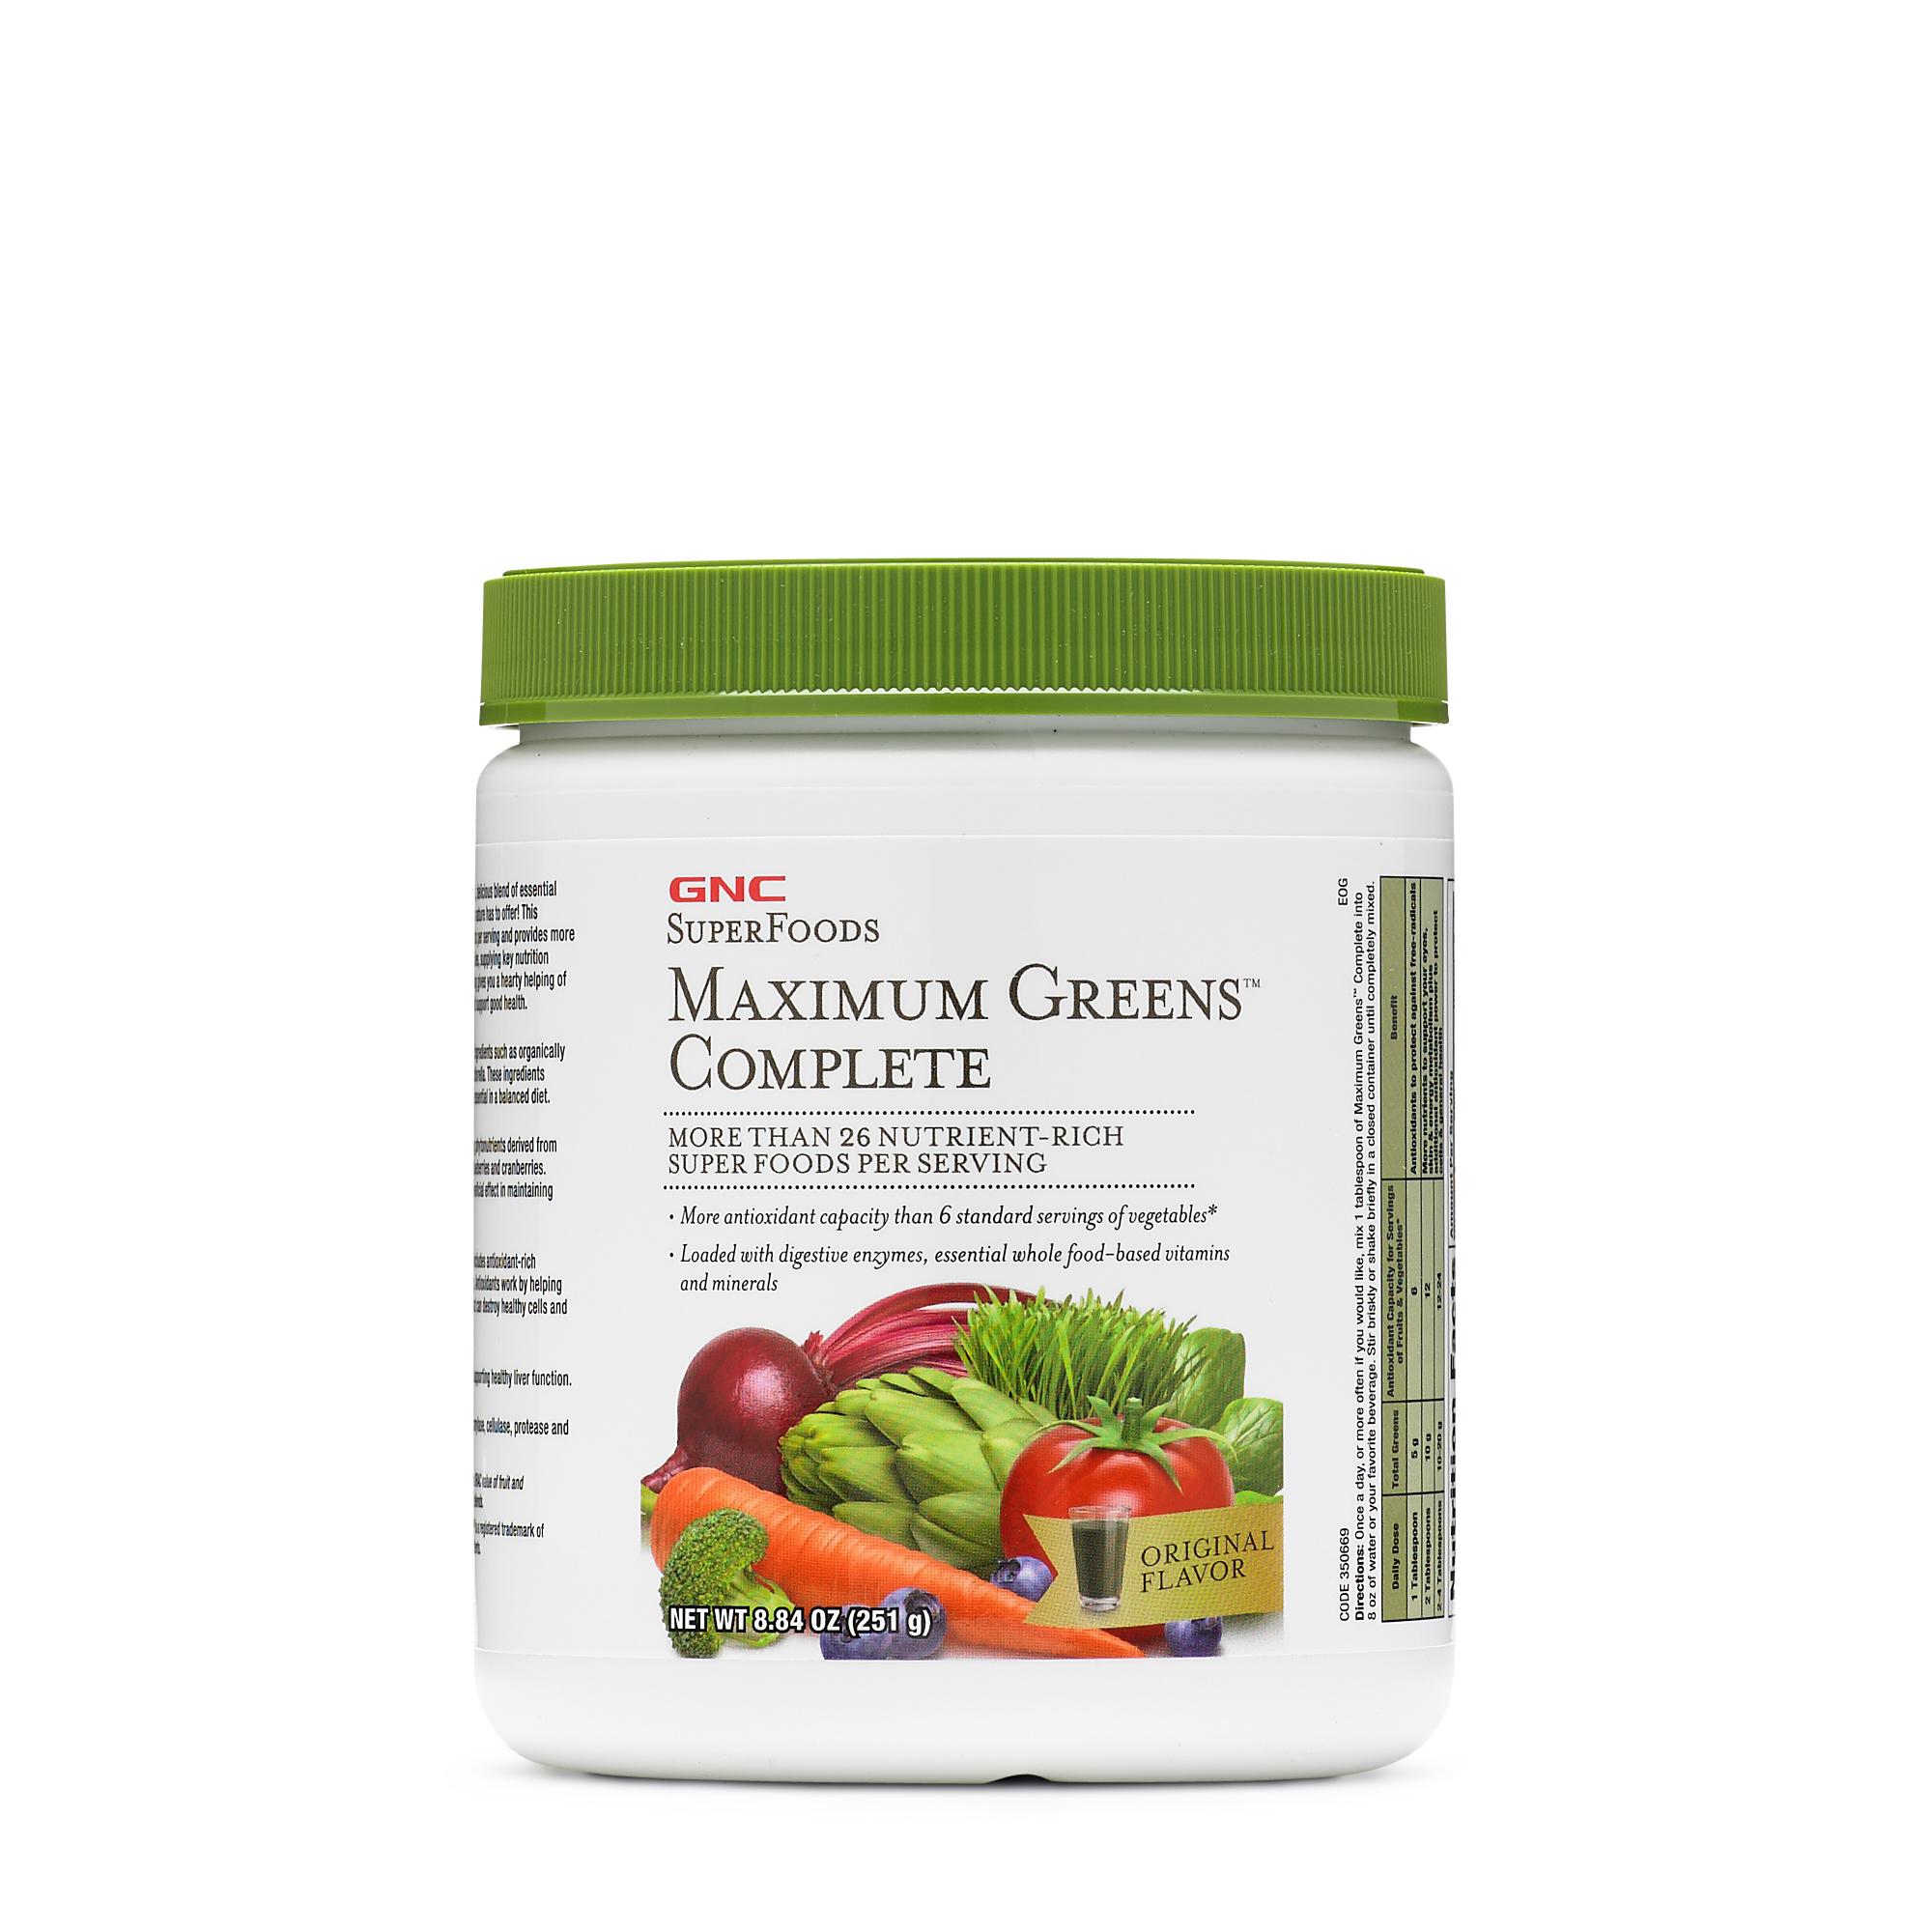 Gnc Superfoods Maximum Greens Complete Original Flavor Gnc